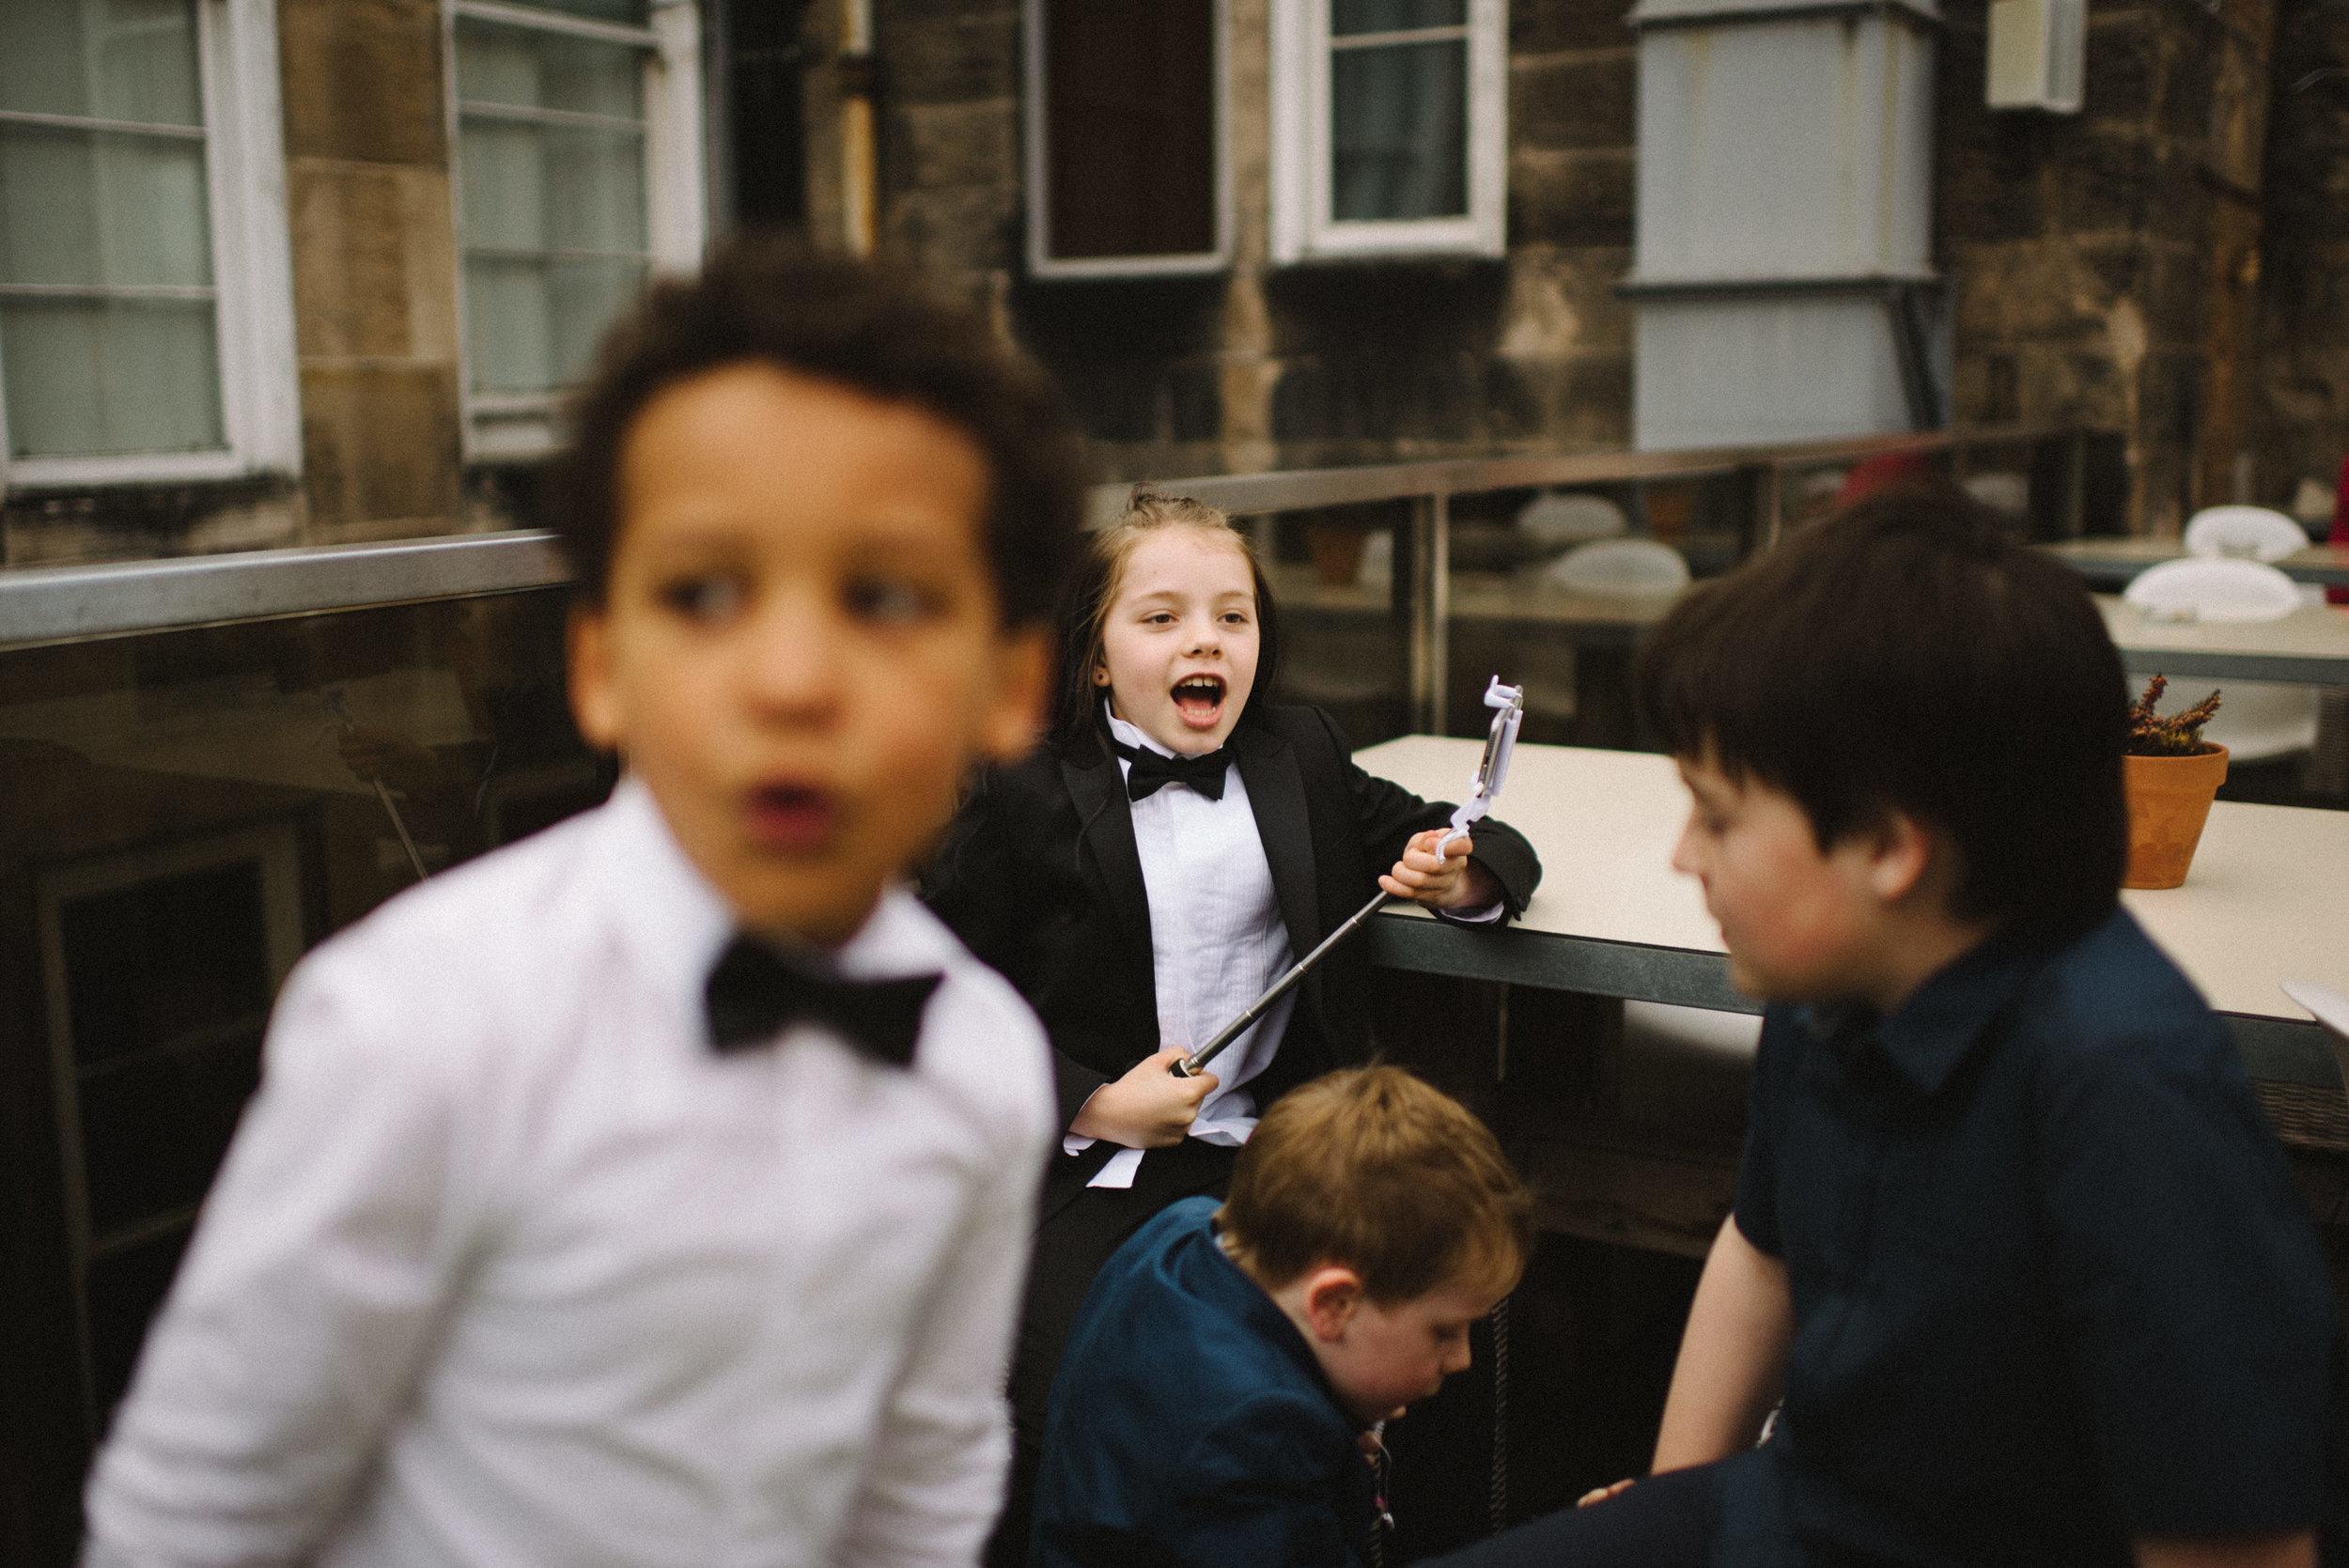 0051-LISA-DEVINE-PHOTOGRAPHY-ALTERNATIVE-WEDDING-PHOTOGRAPHY-SCOTLAND-DESTINATION-WEDDINGS-GLASGOW-WEDDINGS-COOL-WEDDINGS-STYLISH-WEDDINGS.JPG